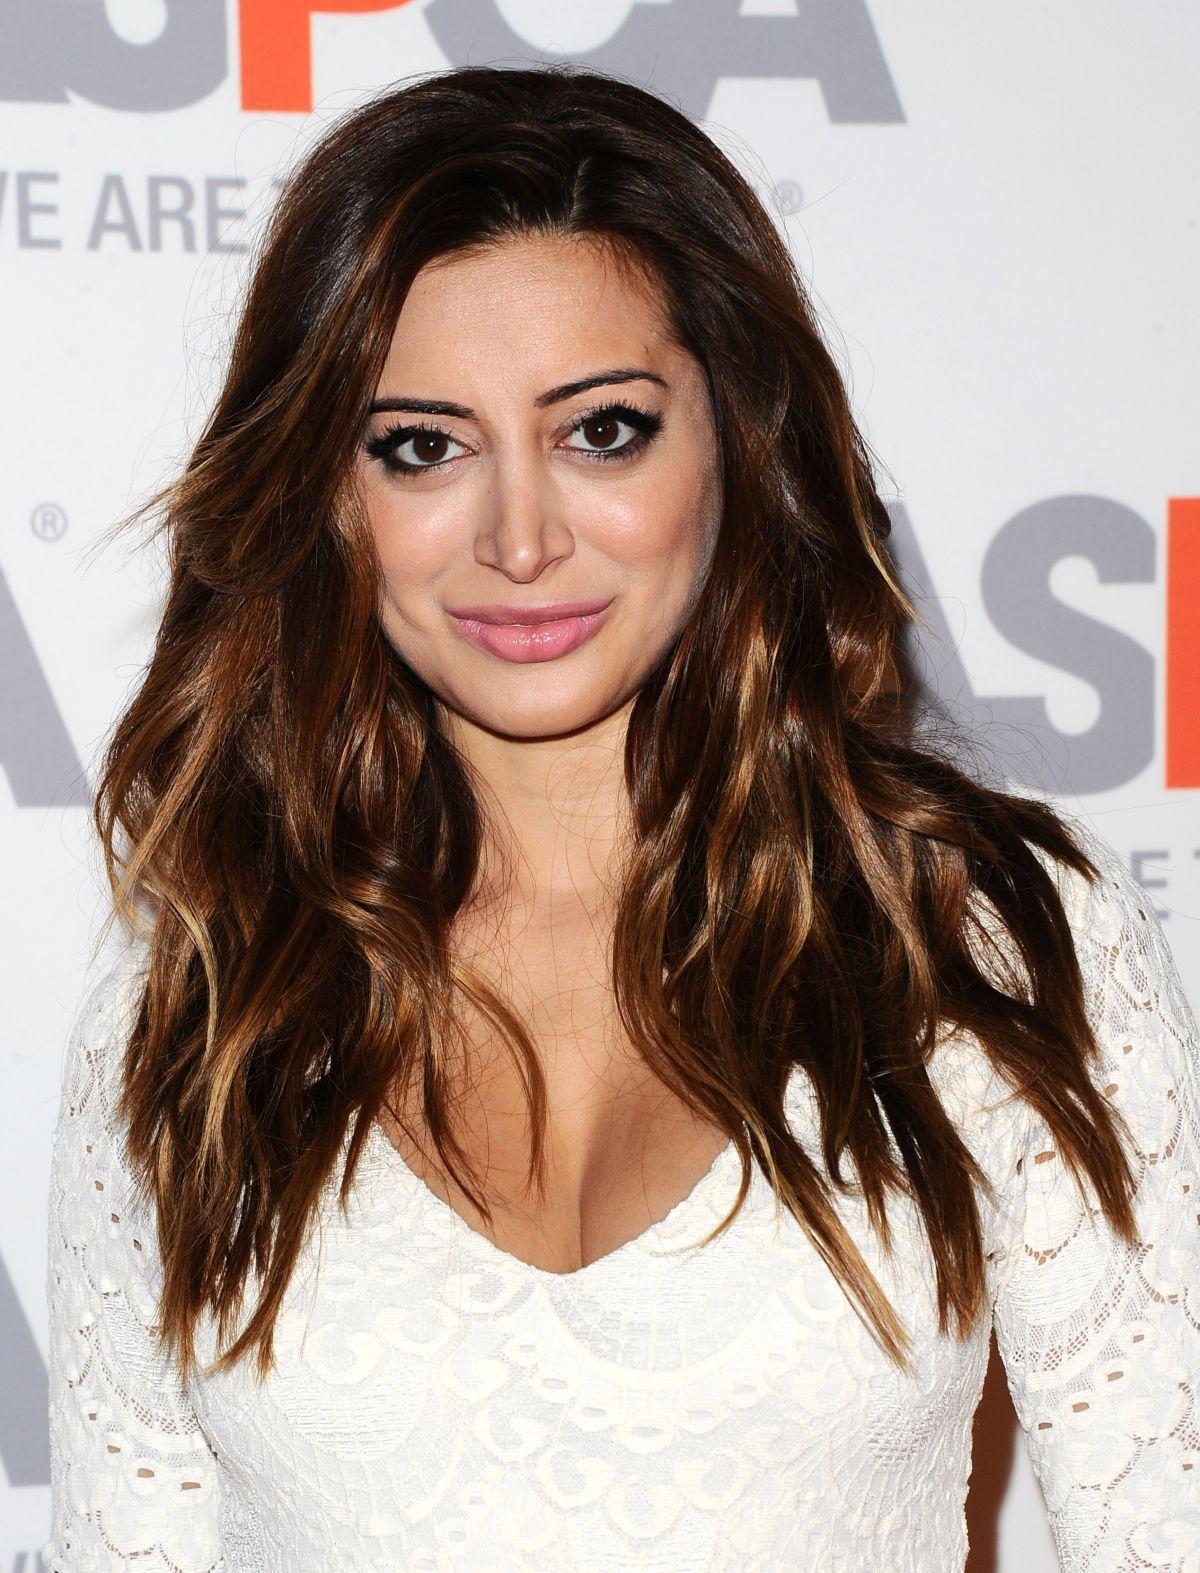 Celebrites Noureen DeWulf nude (66 photos), Tits, Hot, Feet, bra 2018